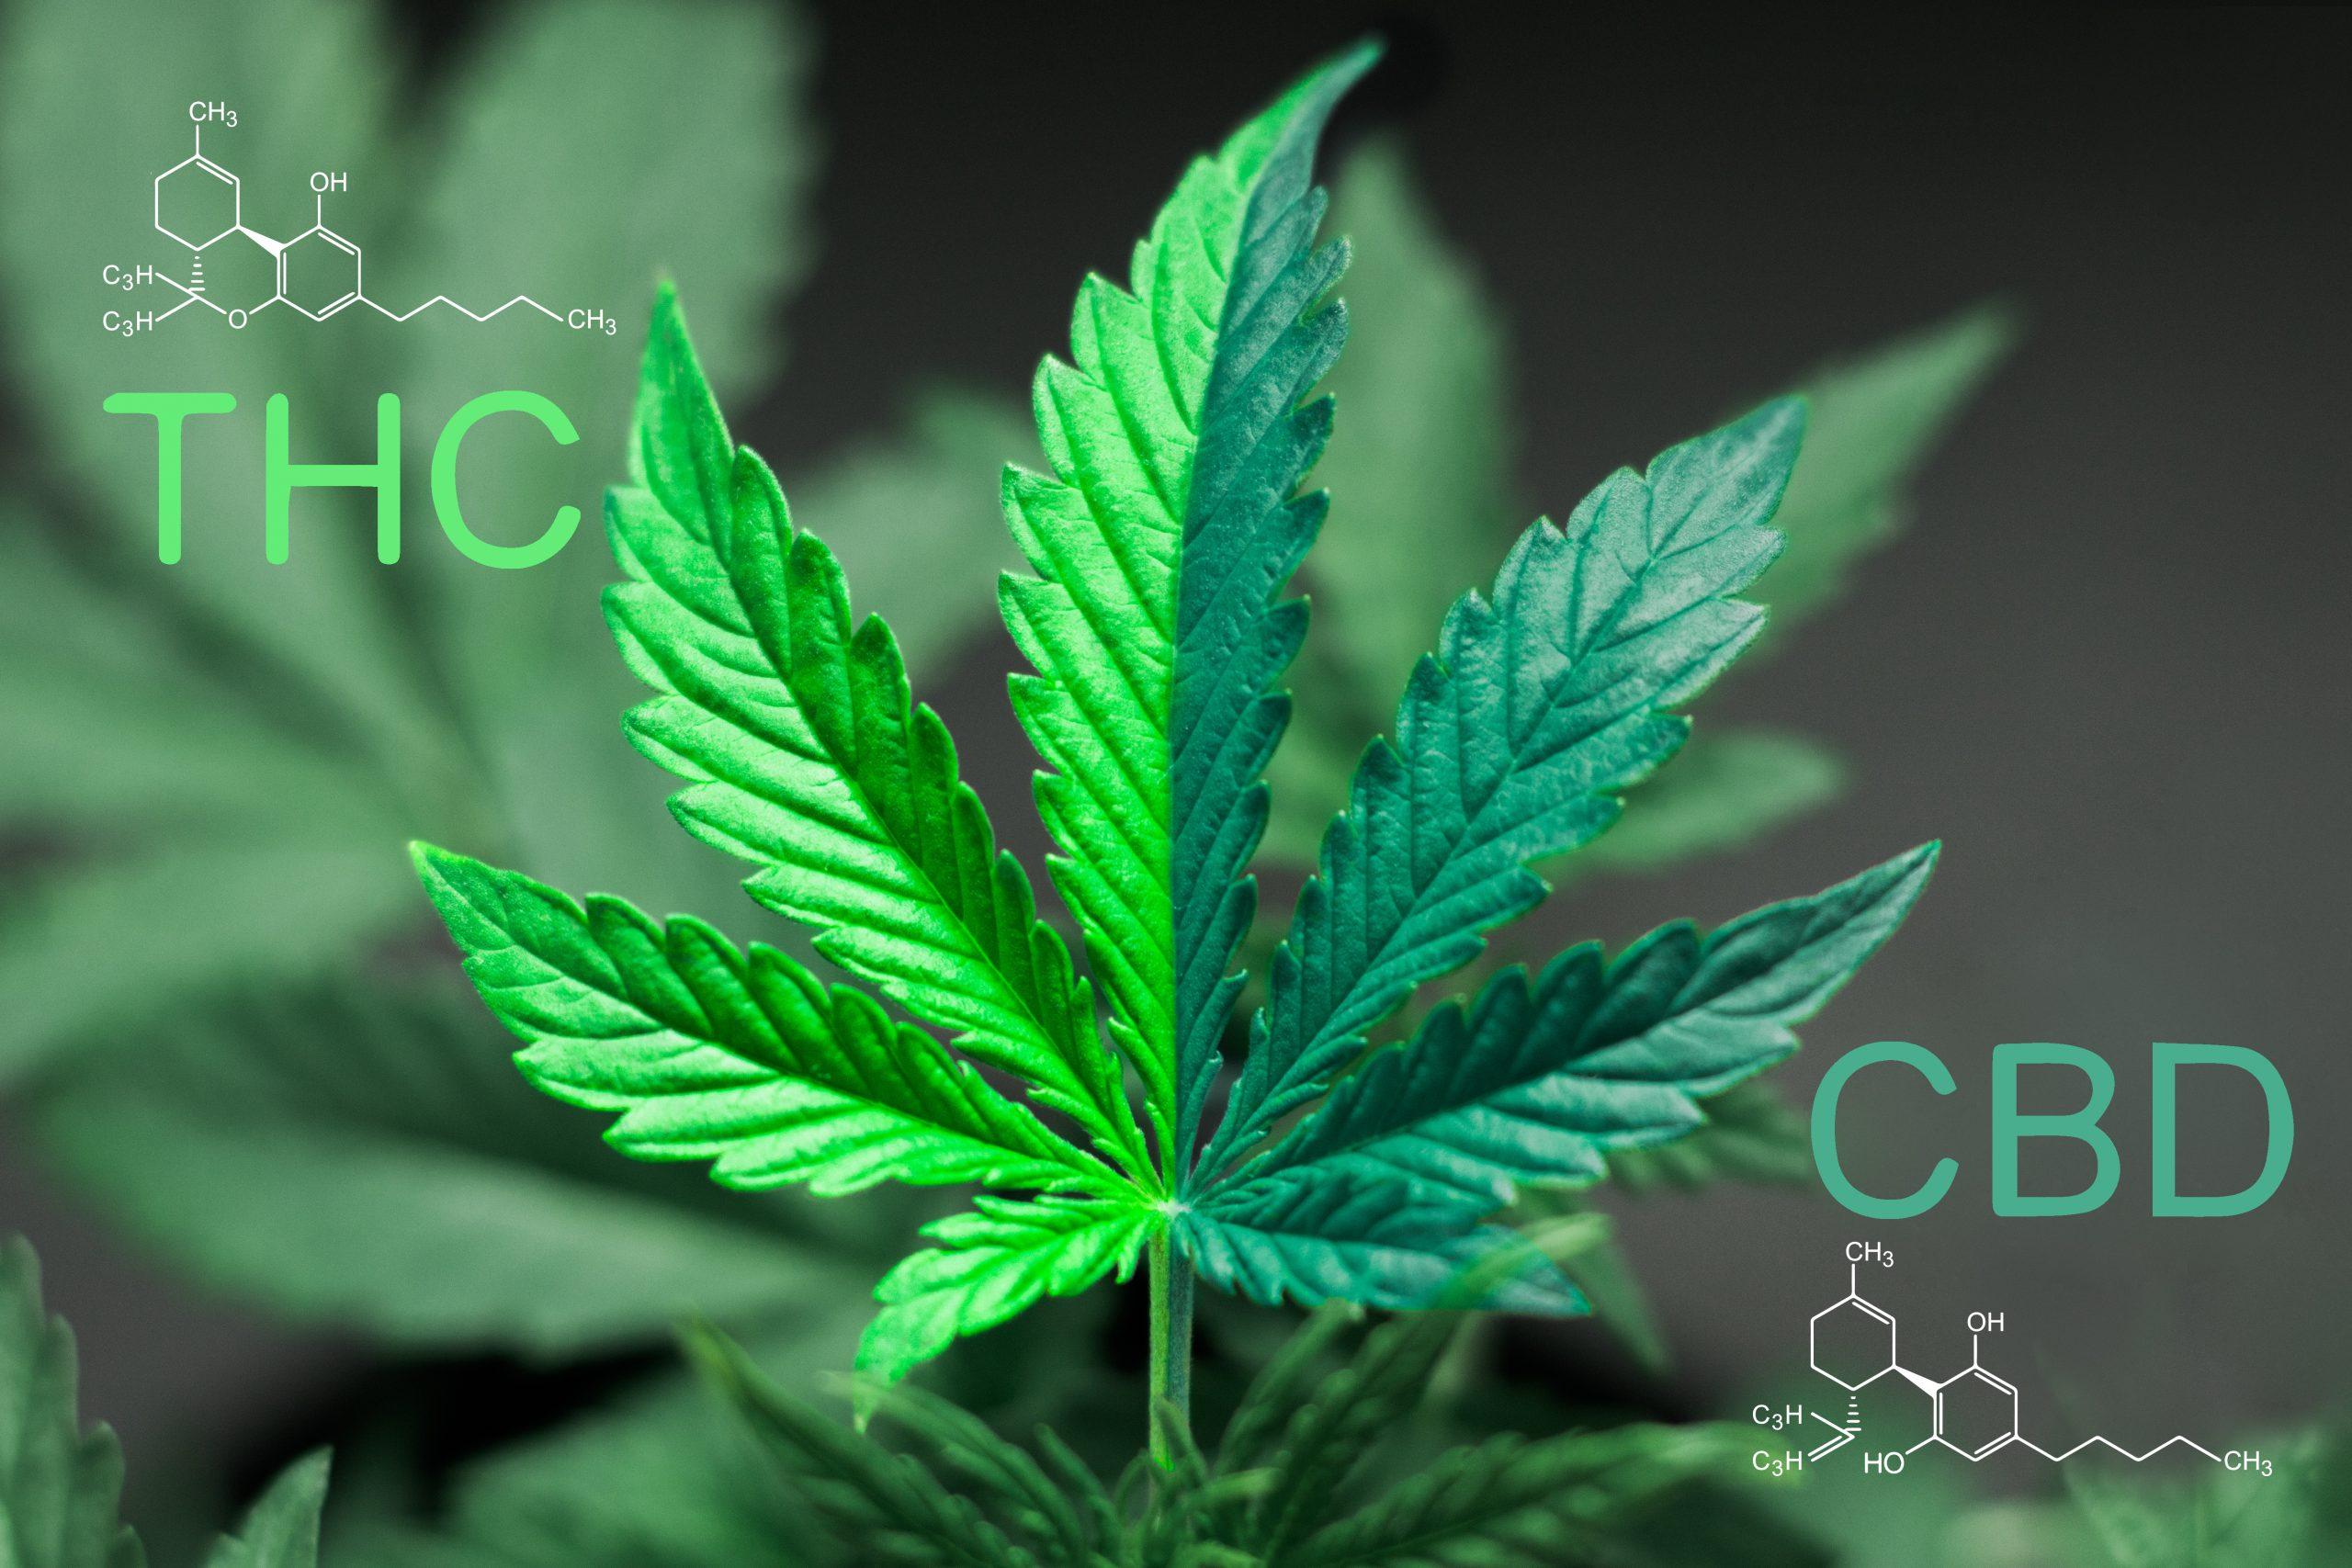 A beautiful sheet of cannabis marijuana in the defocus with the image of the formula CBD